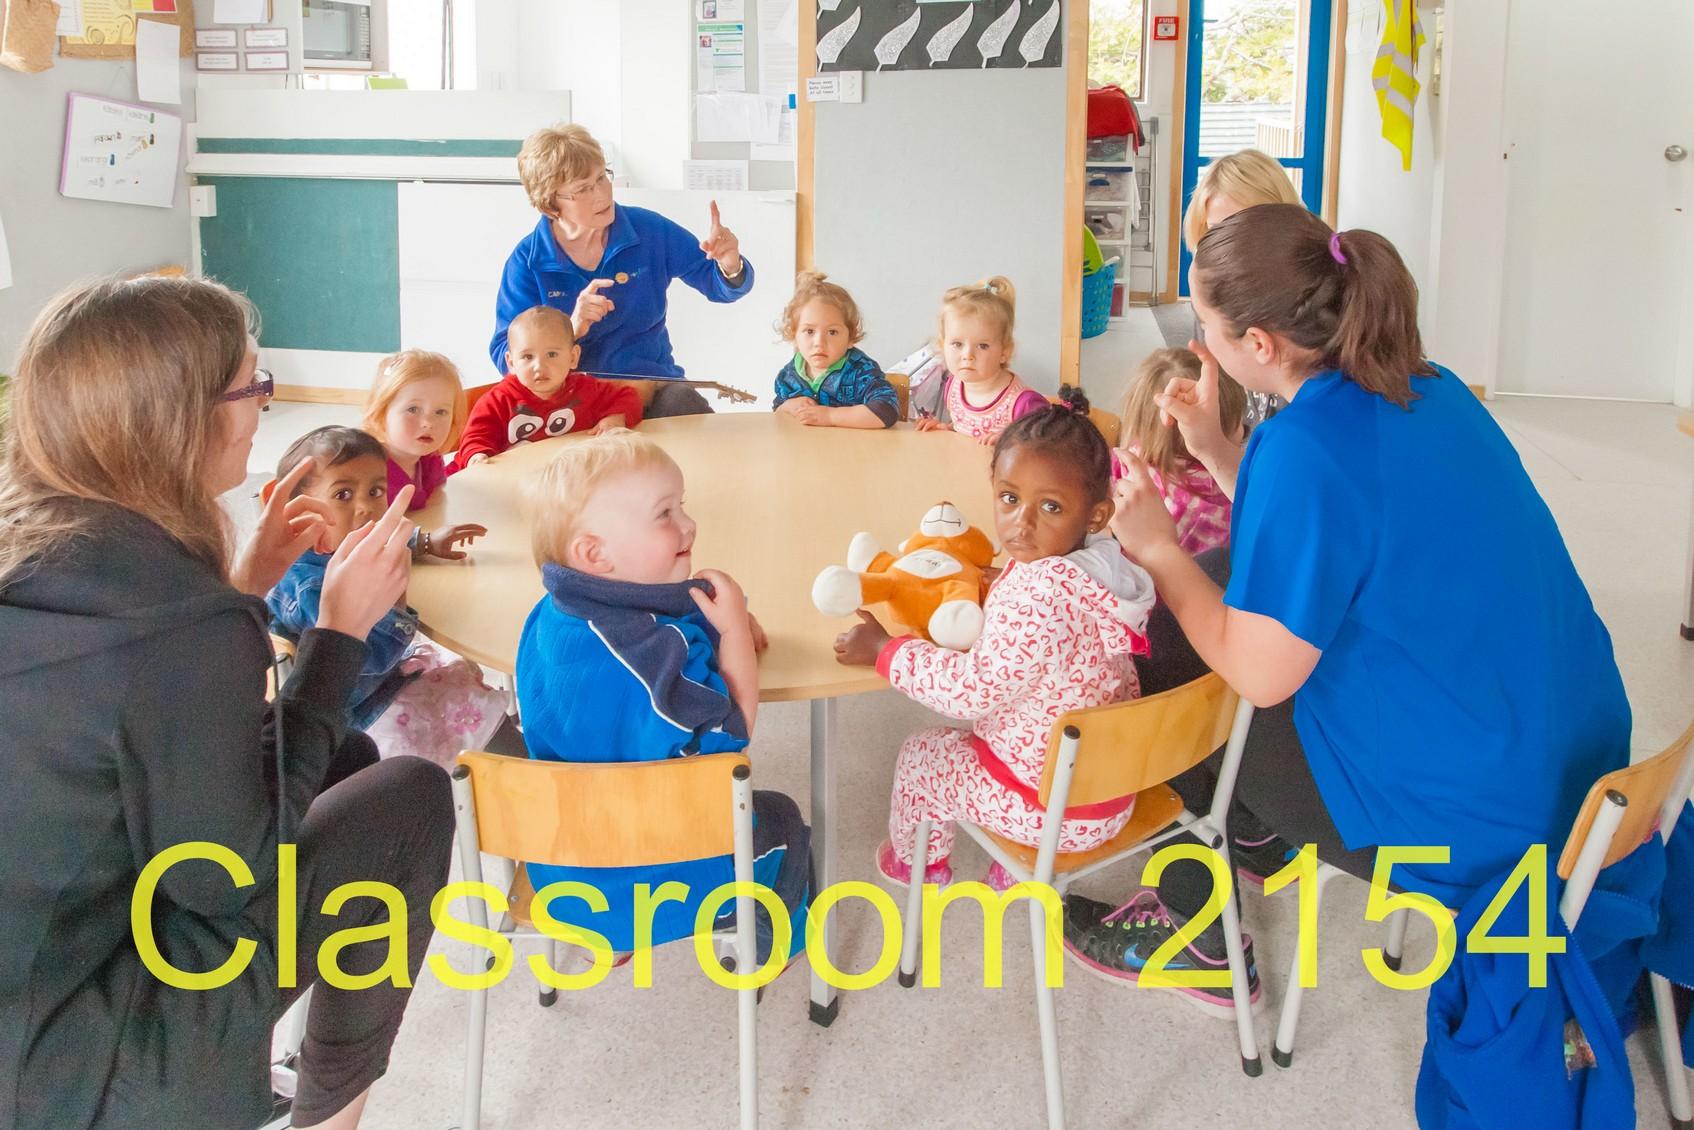 Classroom 2154